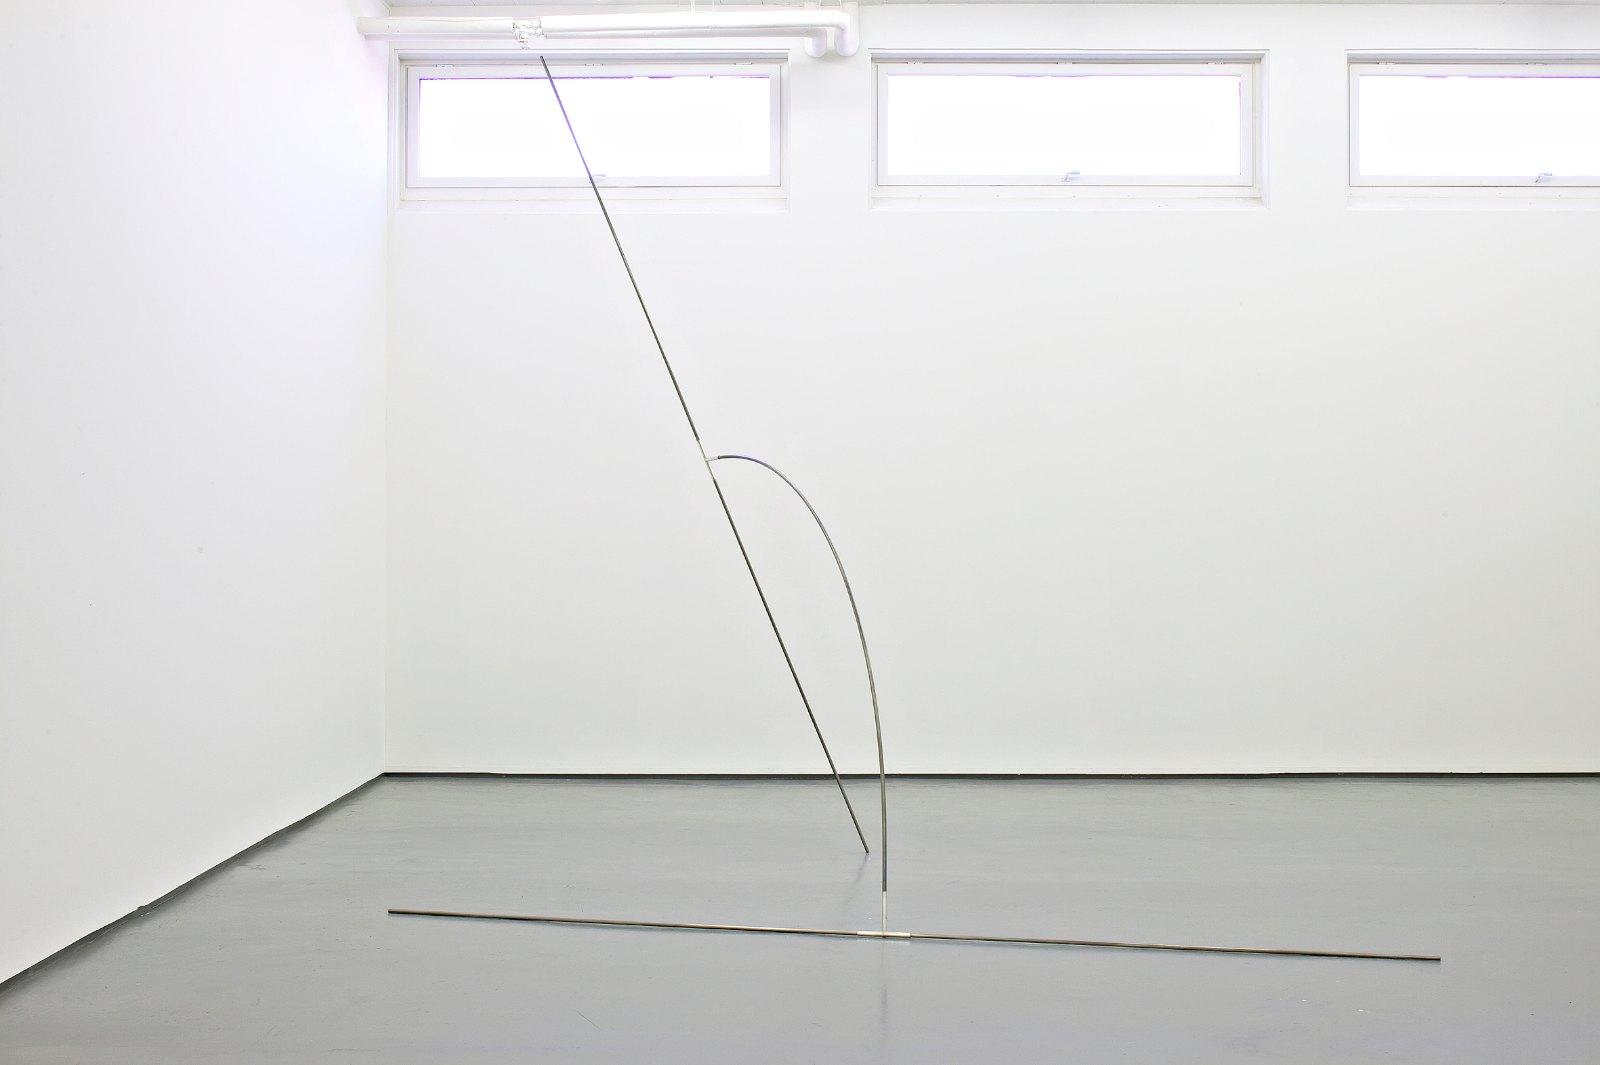 Sculpture II, 2006, steel, silver, 374 x 400 x 200 cm